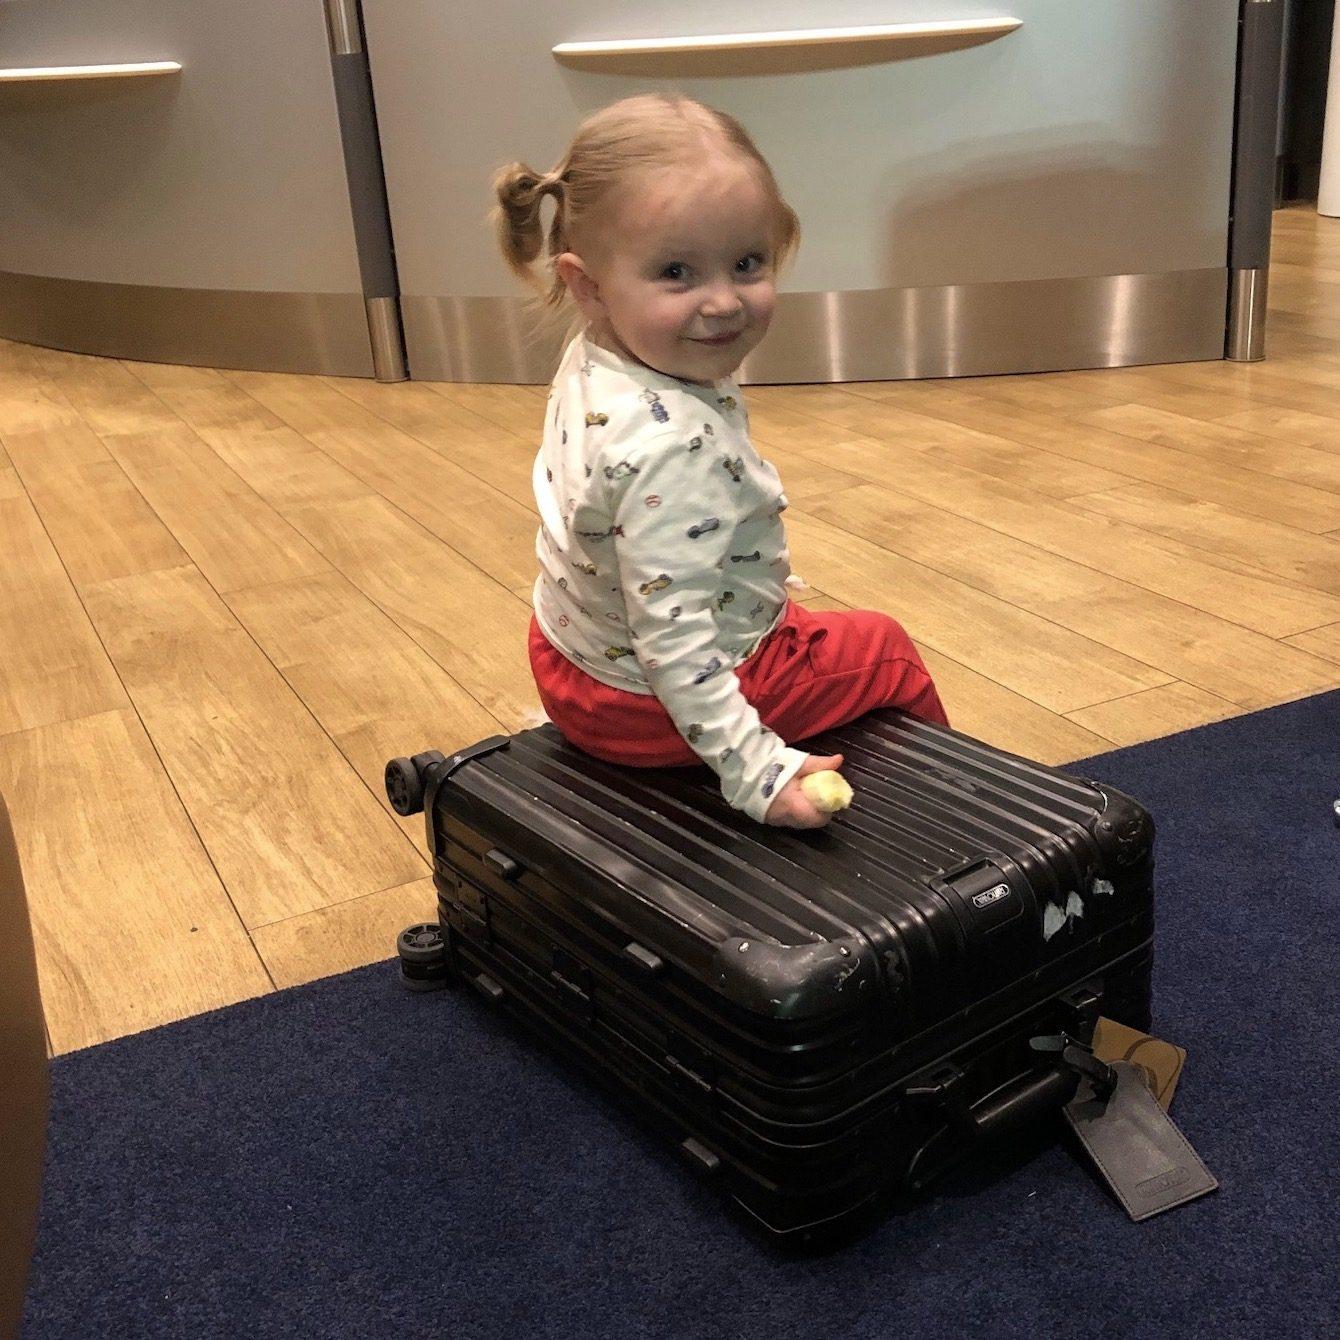 Mit Kindern ins Ausland - www.expatmamas.de/ - #imauslandzuhause #expatmamas #mitkinderninsausland